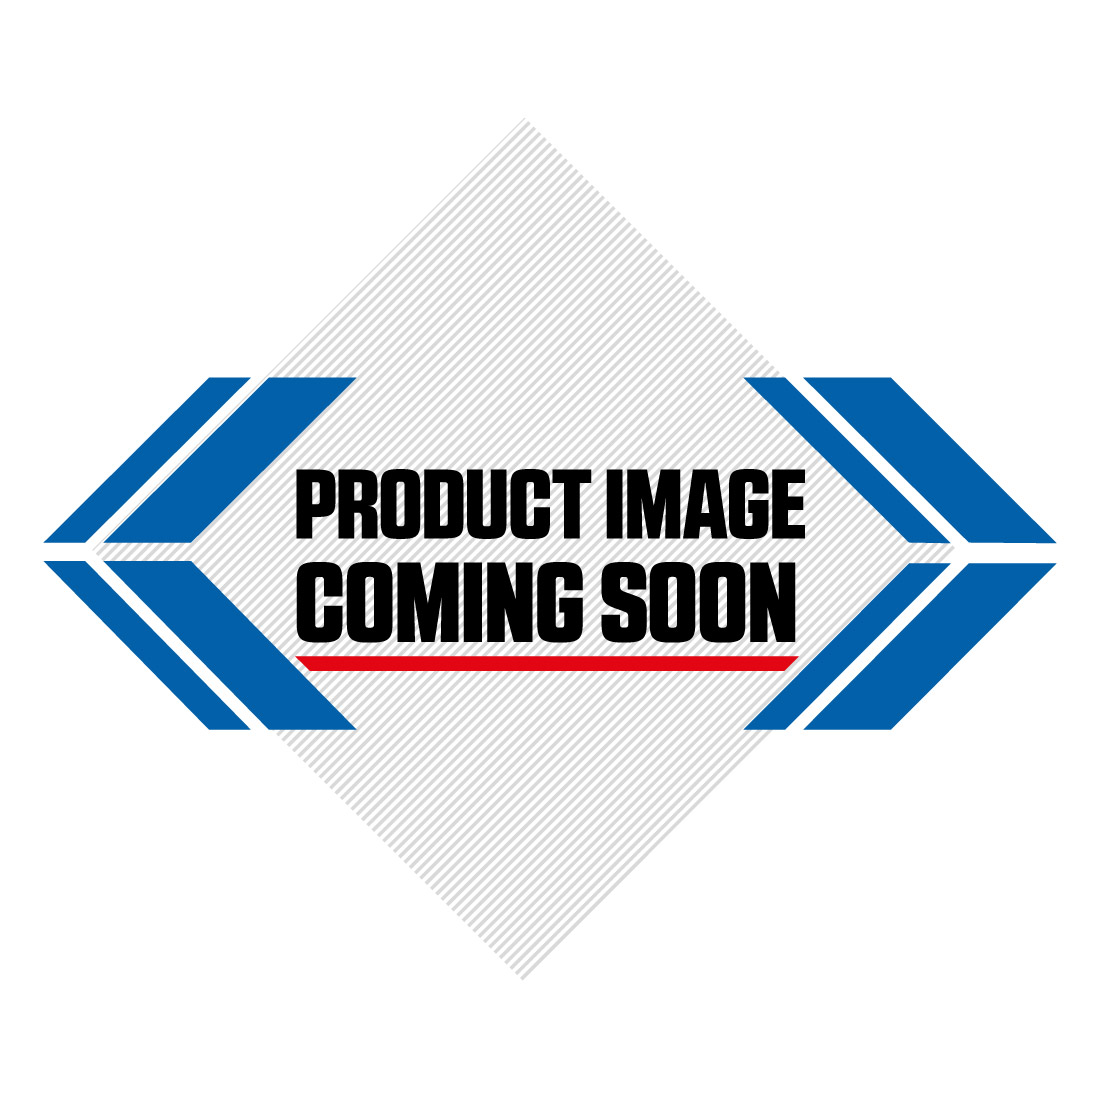 Suzuki Plastic Kit RMZ 450 (2013) OEM Factory Image-1